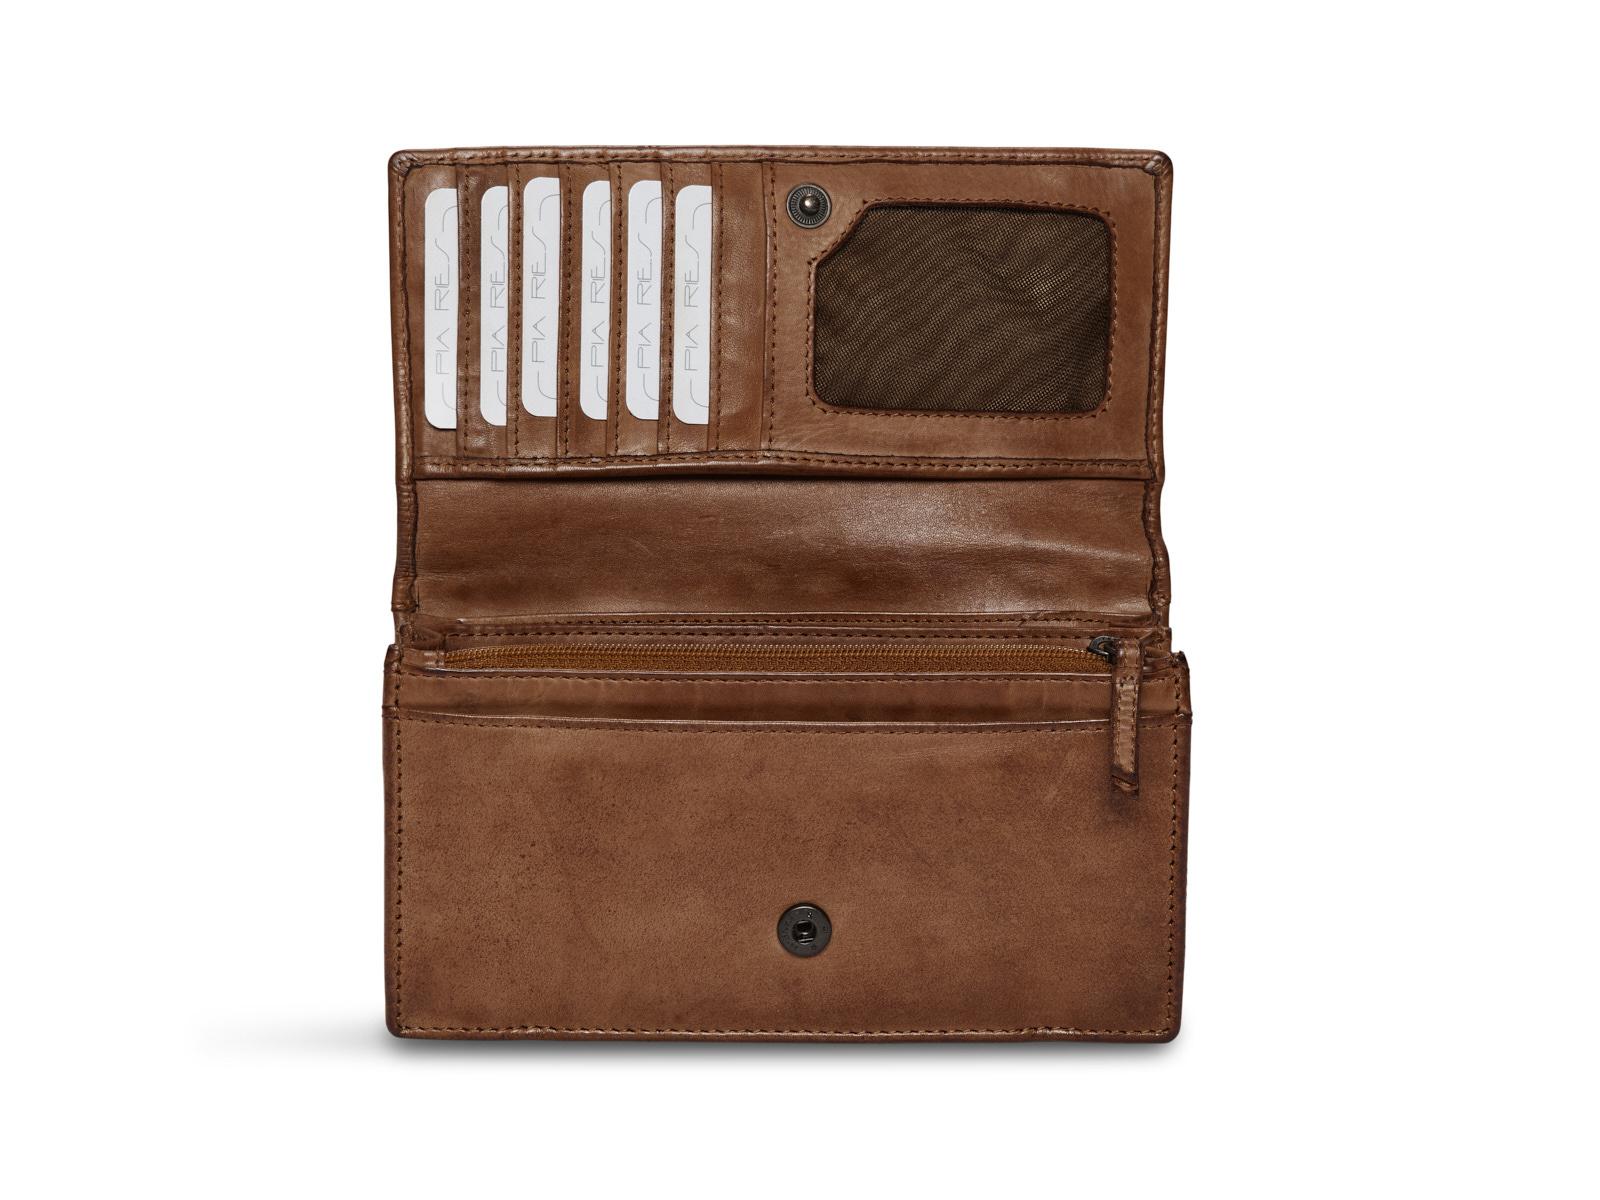 Pia Ries | Washed | Klassieke Overslagportemonnee met veel ruimte | Cognac